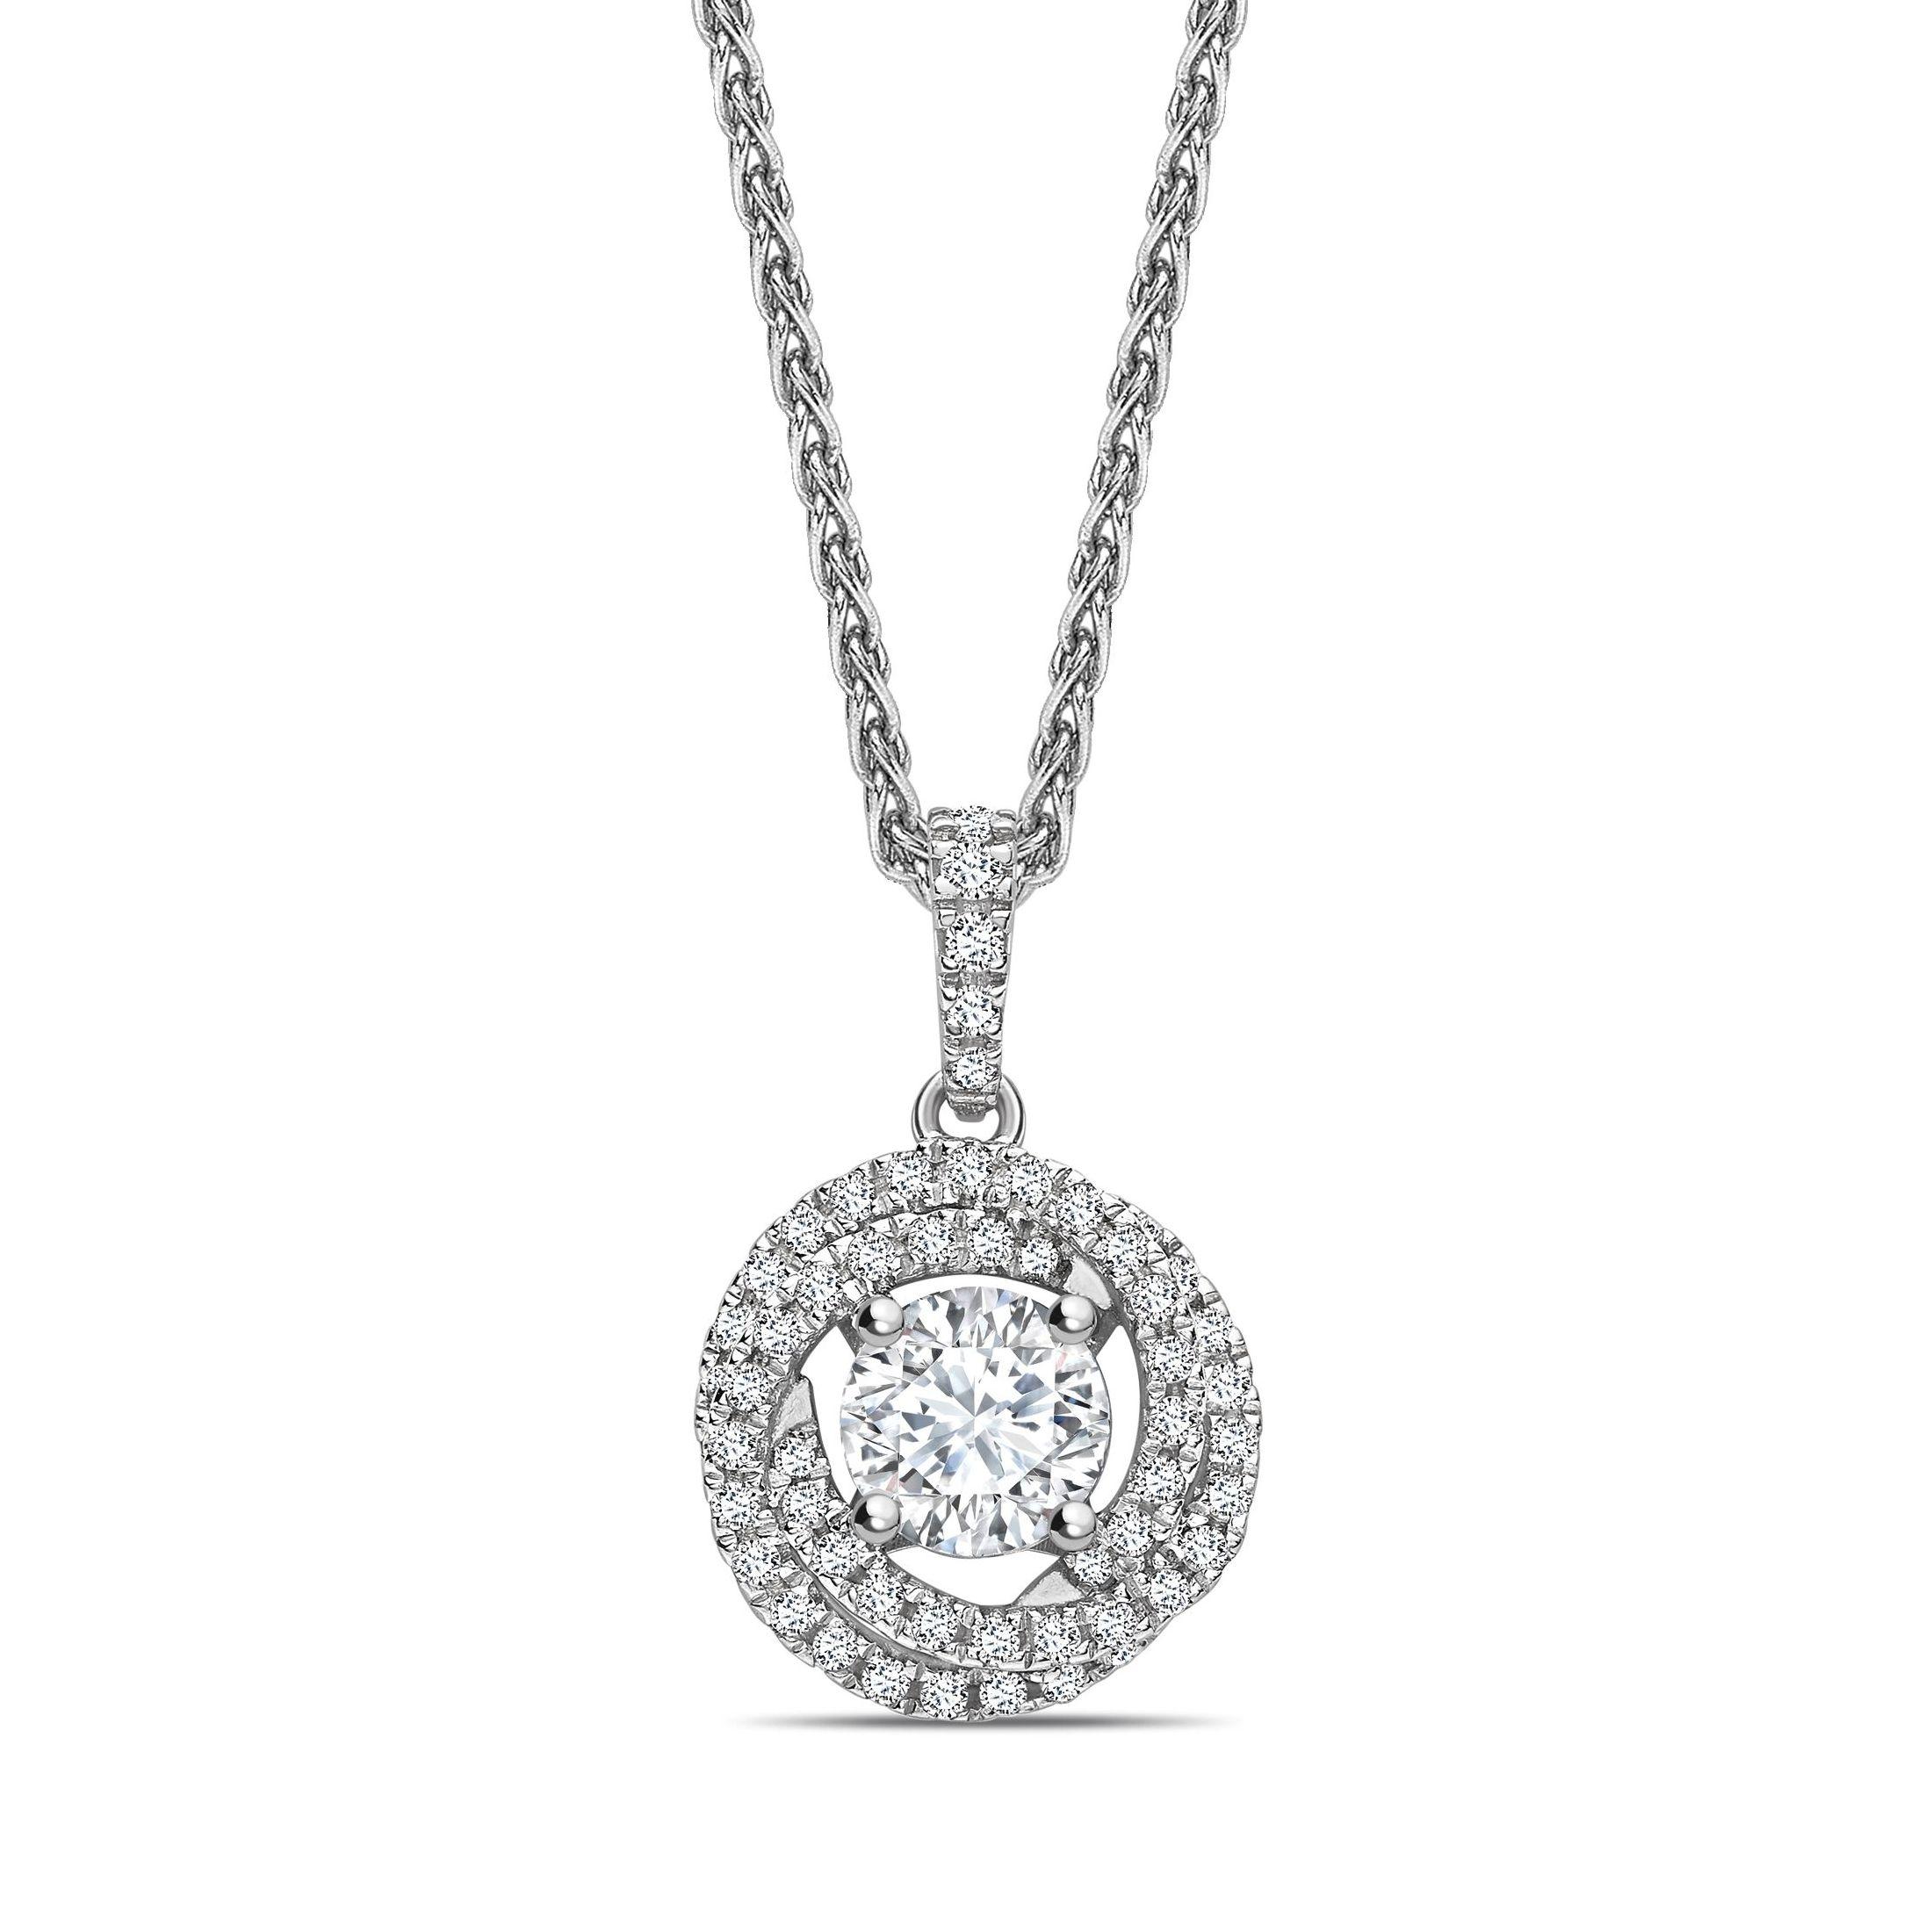 Swirling Style Round Shape Halo Diamond Pendant